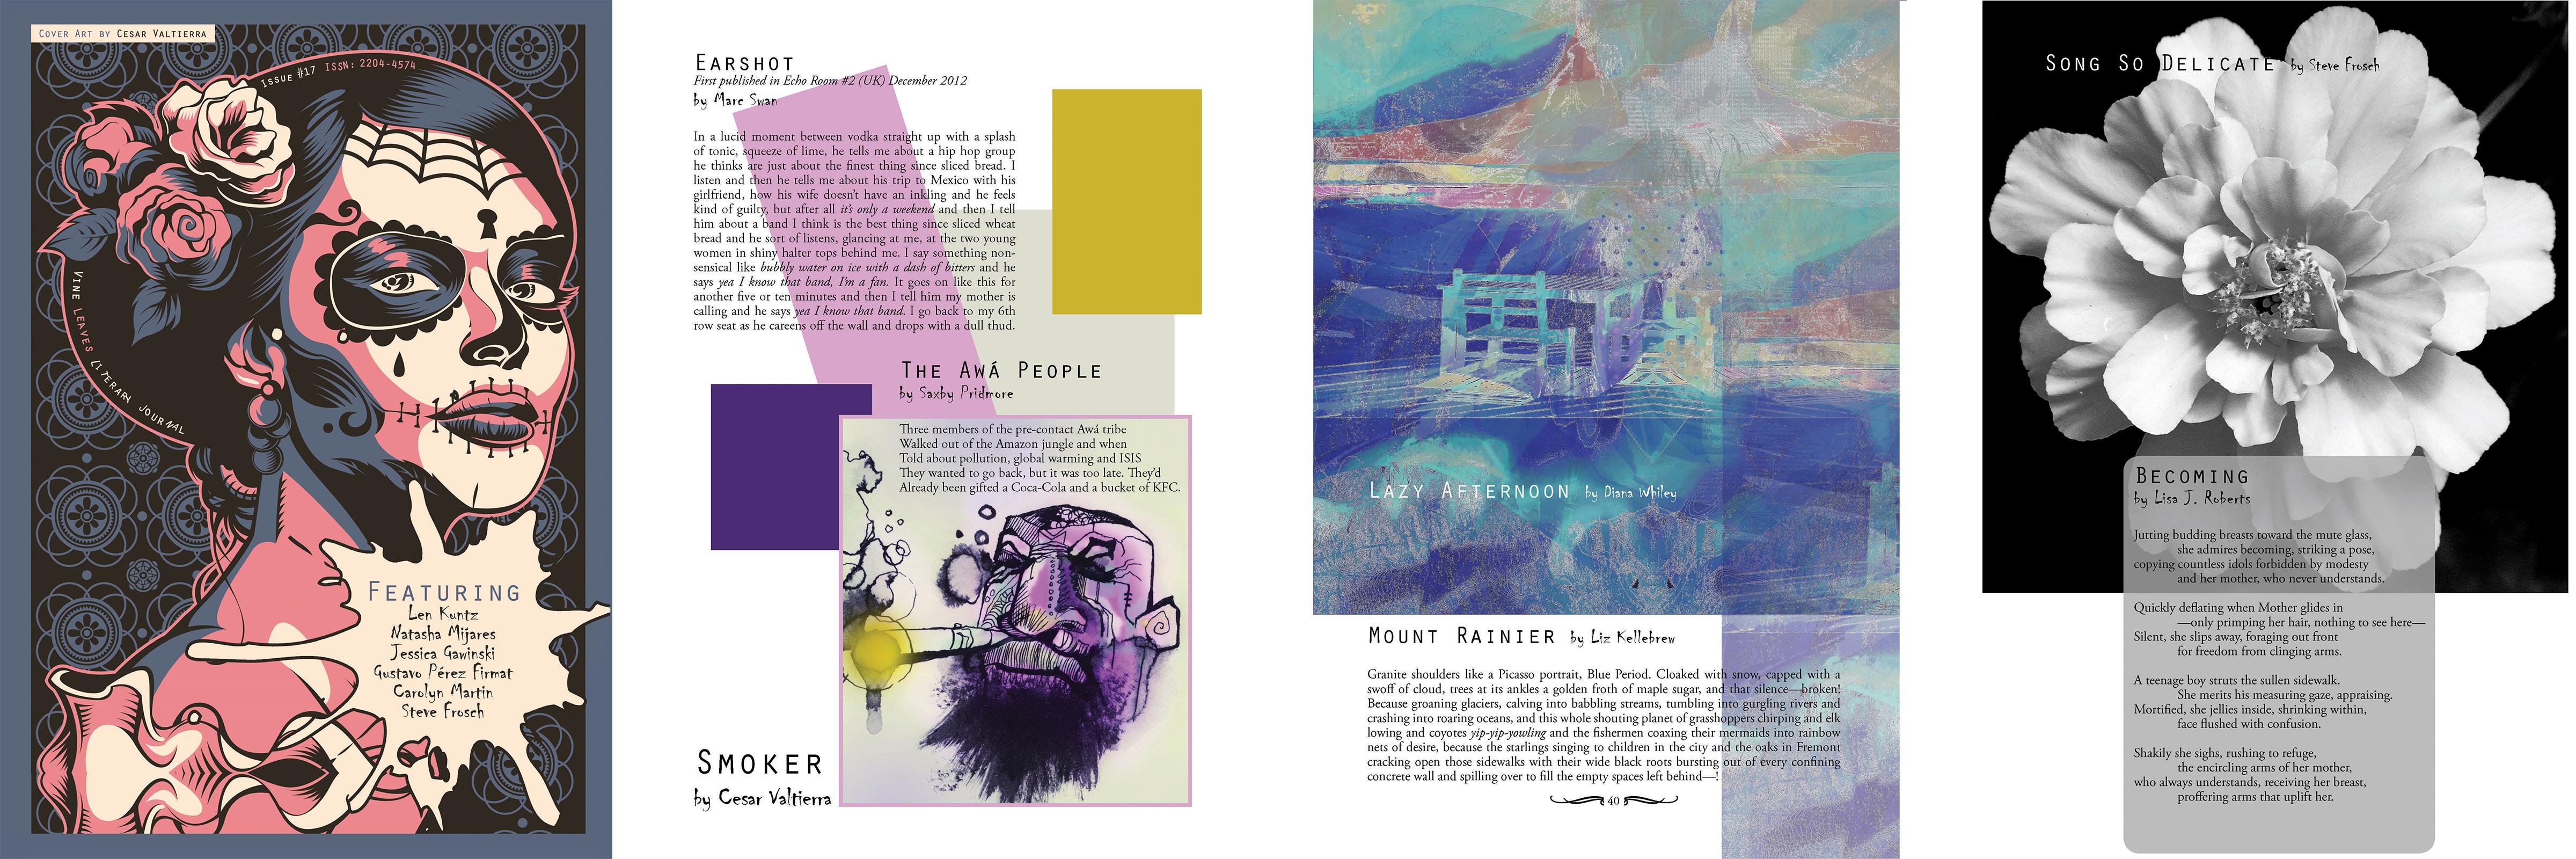 Vine Leaves Journal Issue 17